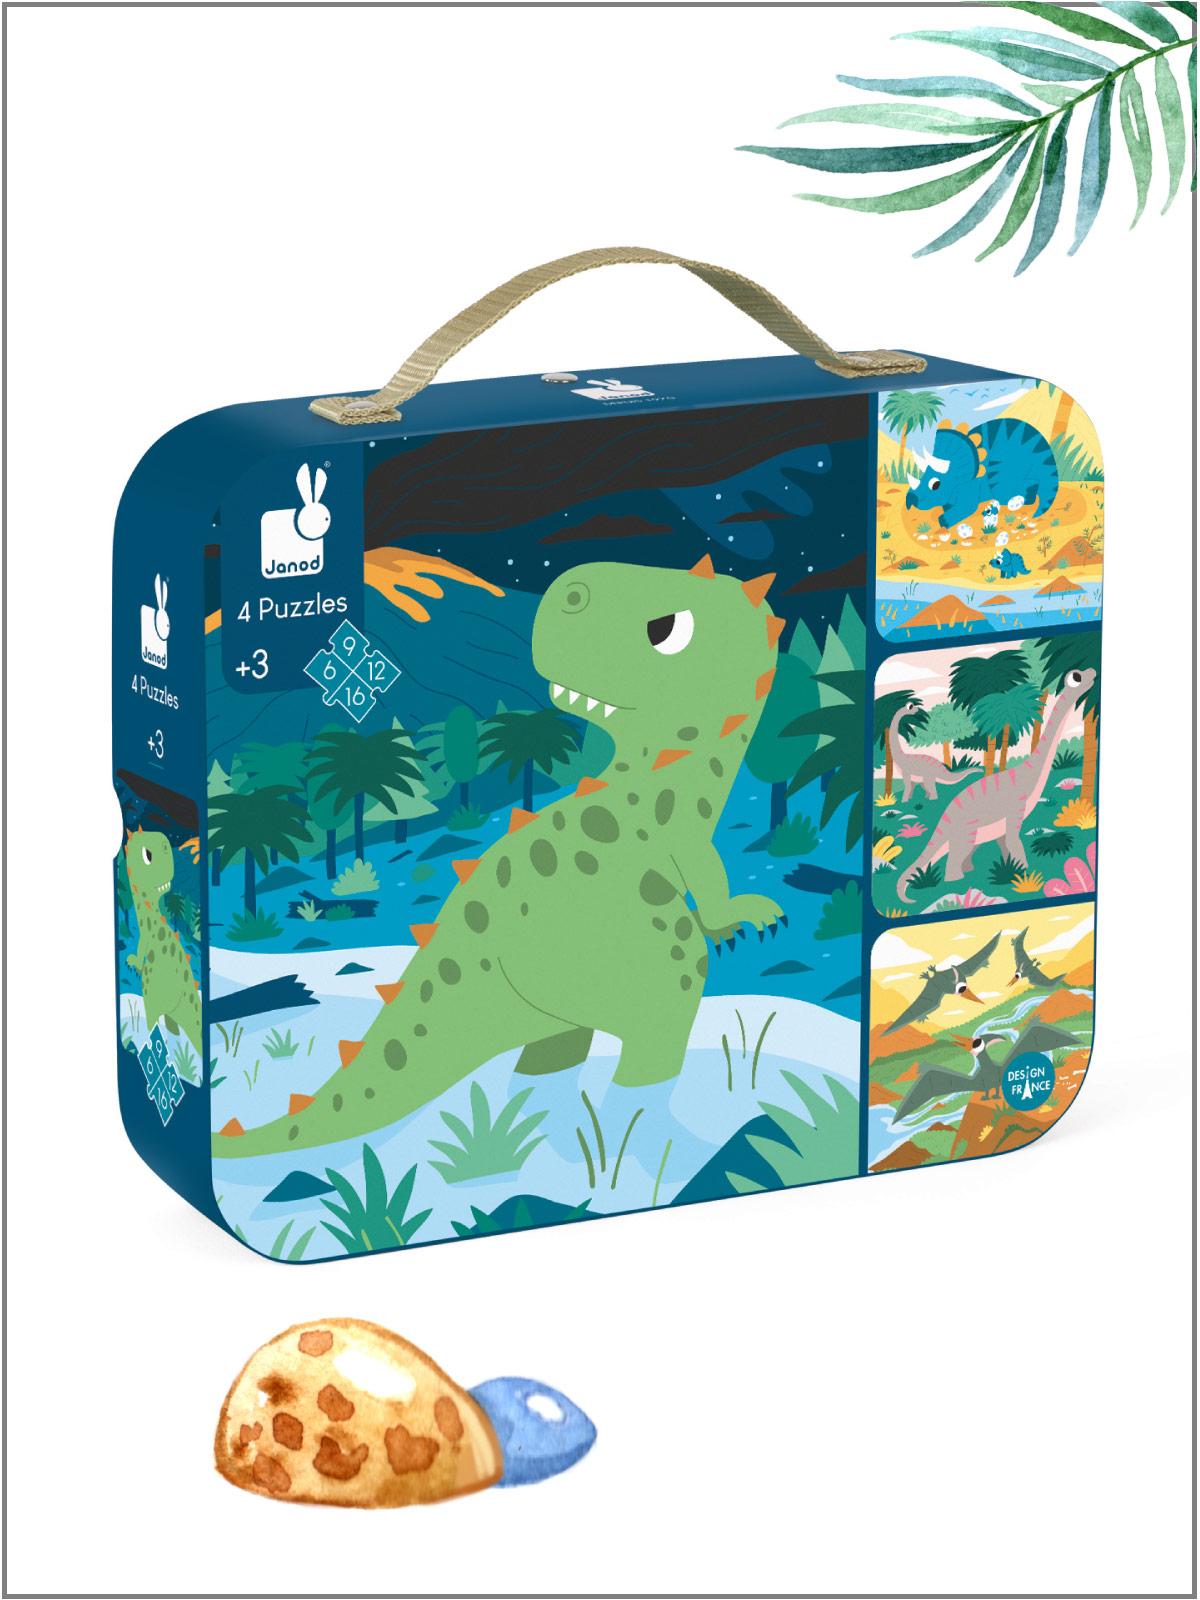 frederickandsophie-kids-toys-janod-france-zoo-puzzle-dinosaurs-suitcase